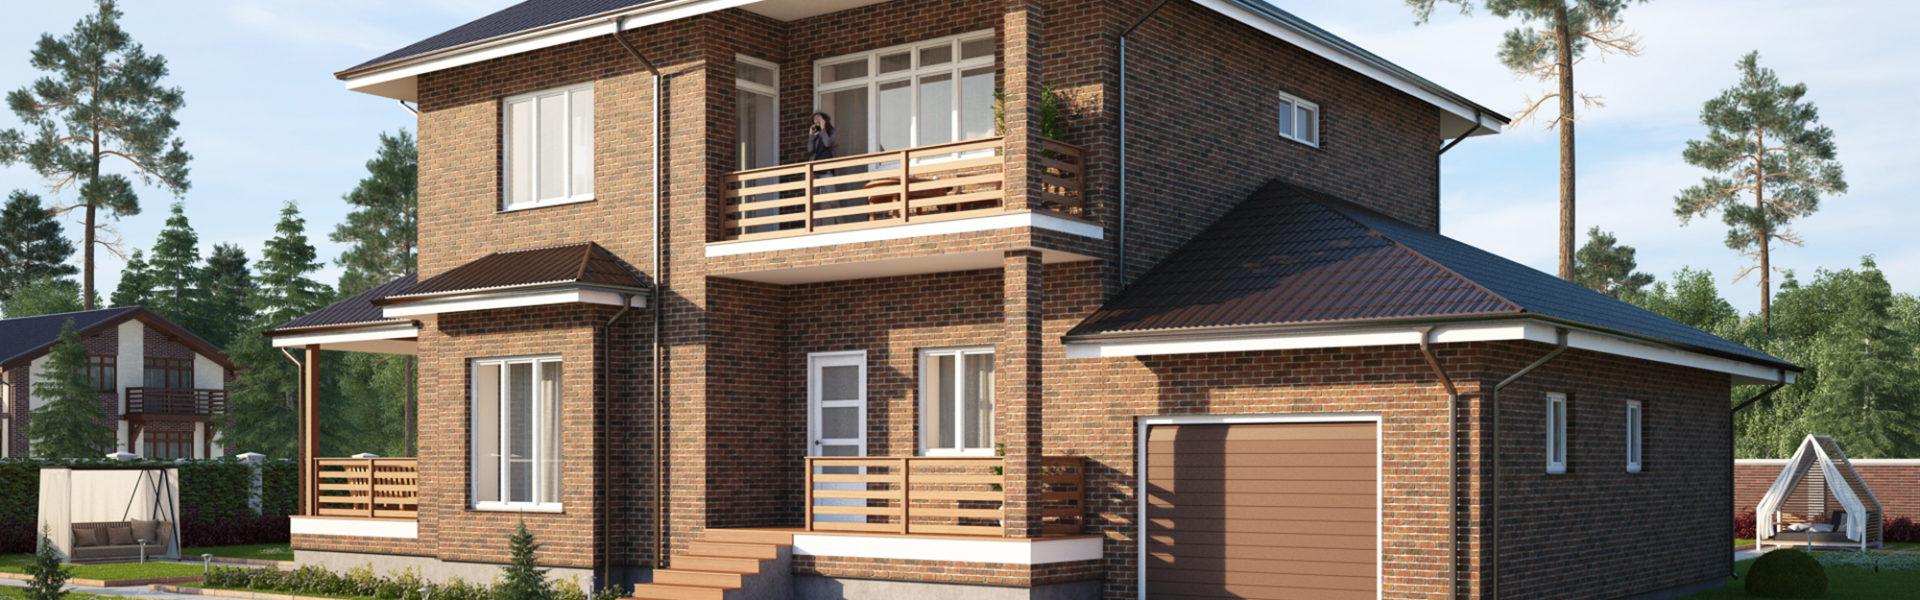 строительство дома в Акулово